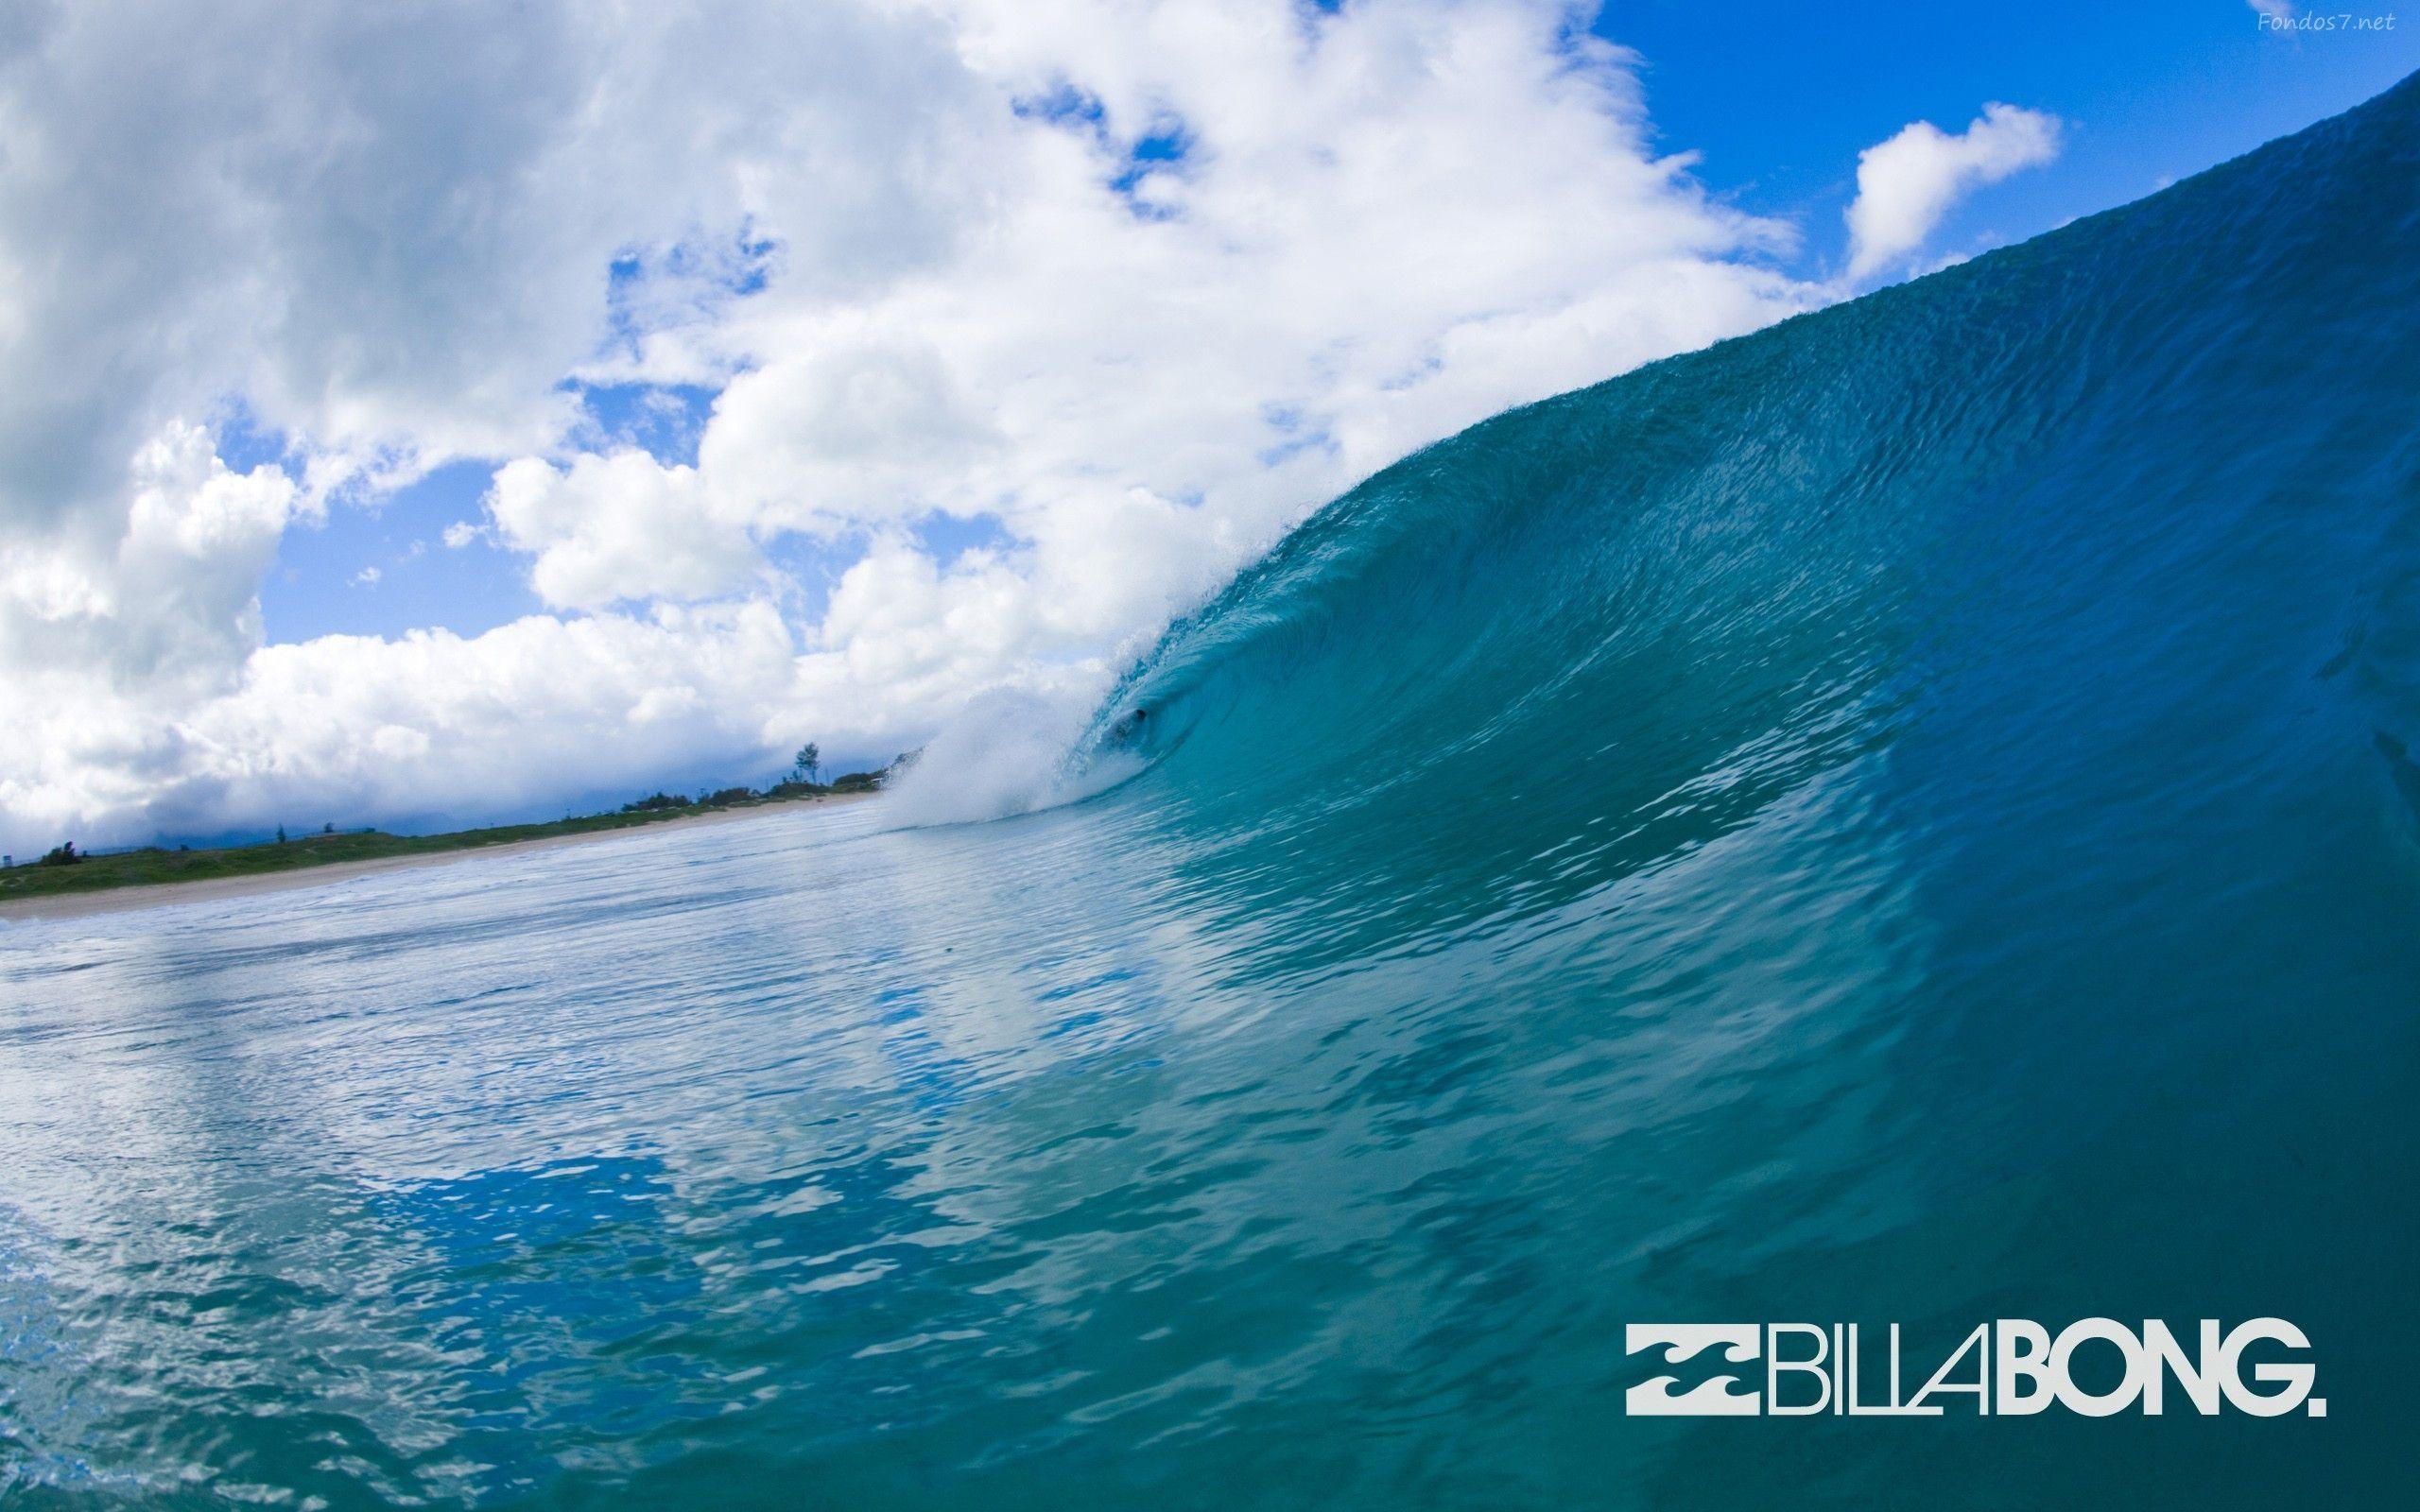 Surfing waves wallpaper